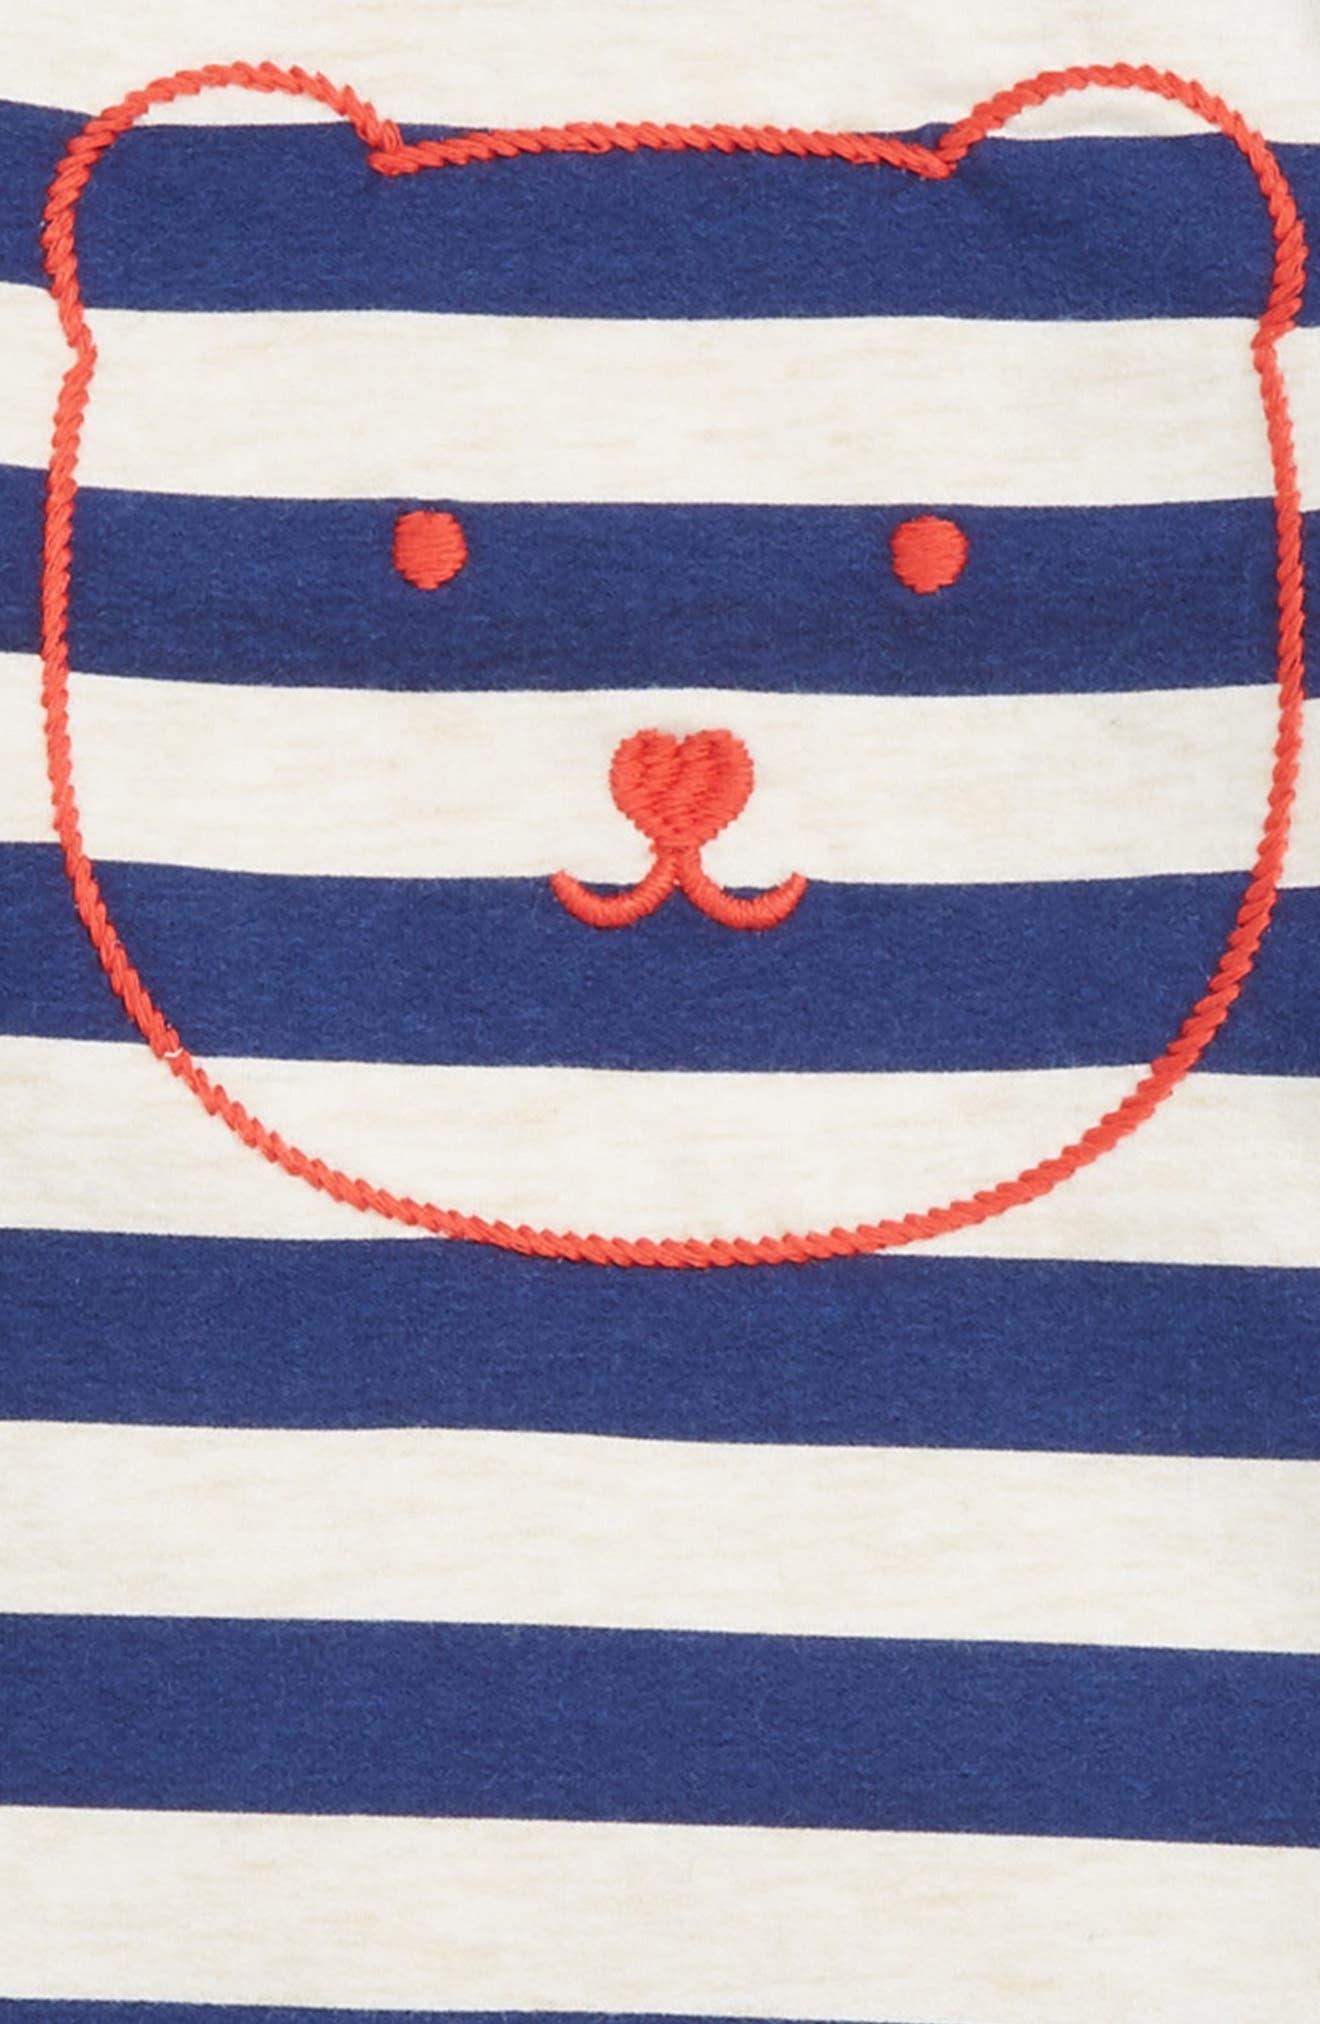 Embroidered Stripe Tunic & Leggings Set,                             Alternate thumbnail 2, color,                             BLUE DEPTHS- RED BEAR